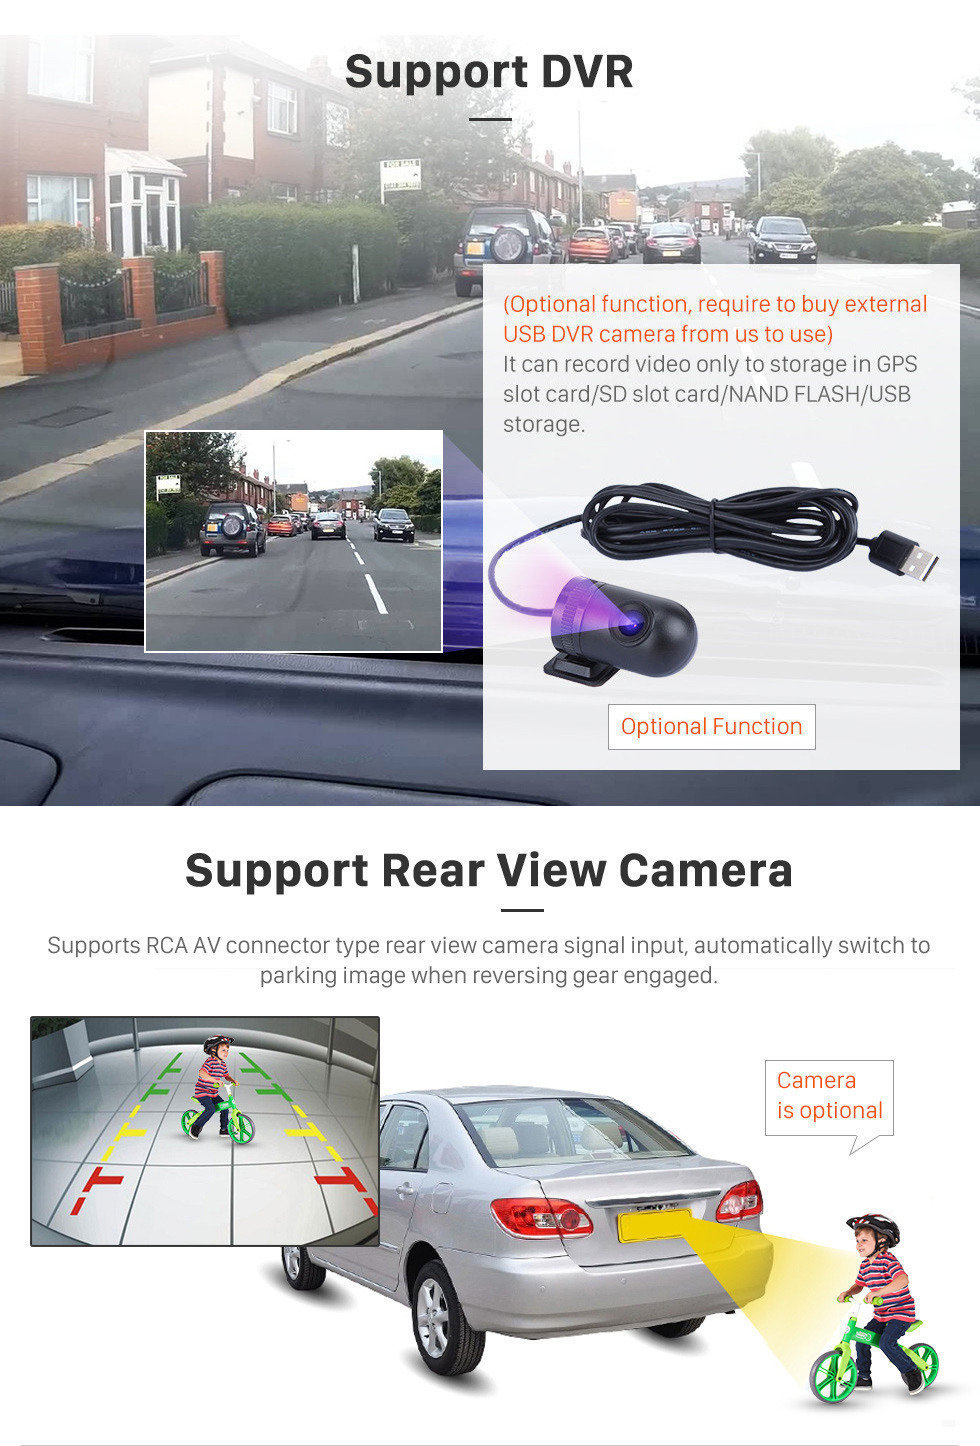 Seicane HD Touchscreen 8 inch Android 9.0 for 2000 2001 2002-2011 Mercedes SLK Class R171 SLK200 SLK280 SLK300 SLK350 SLK55 Radio with GPS Navigation System Bluetooth Carplay support 1080P